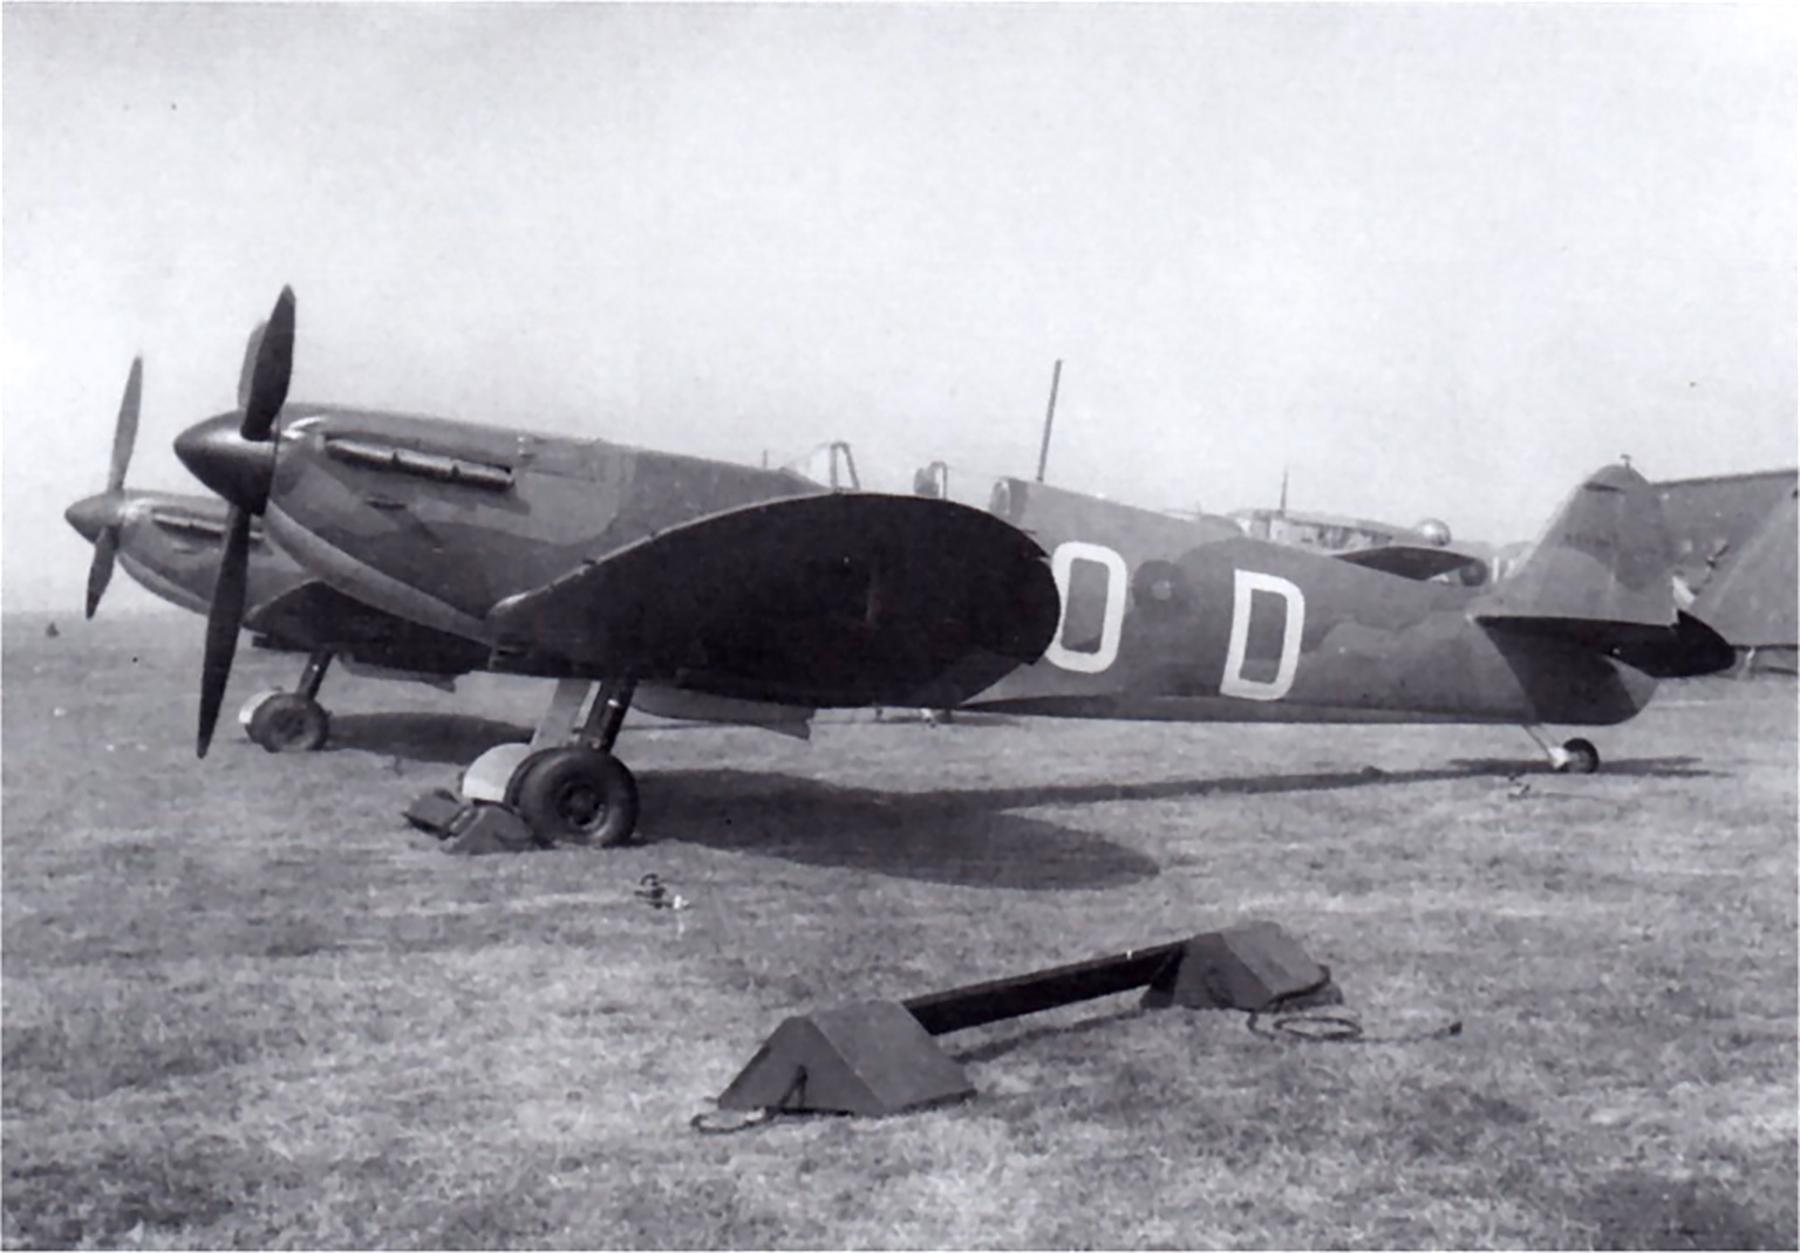 Spitfire MkI RAF early camouflage scheme Battle of France 1940 01